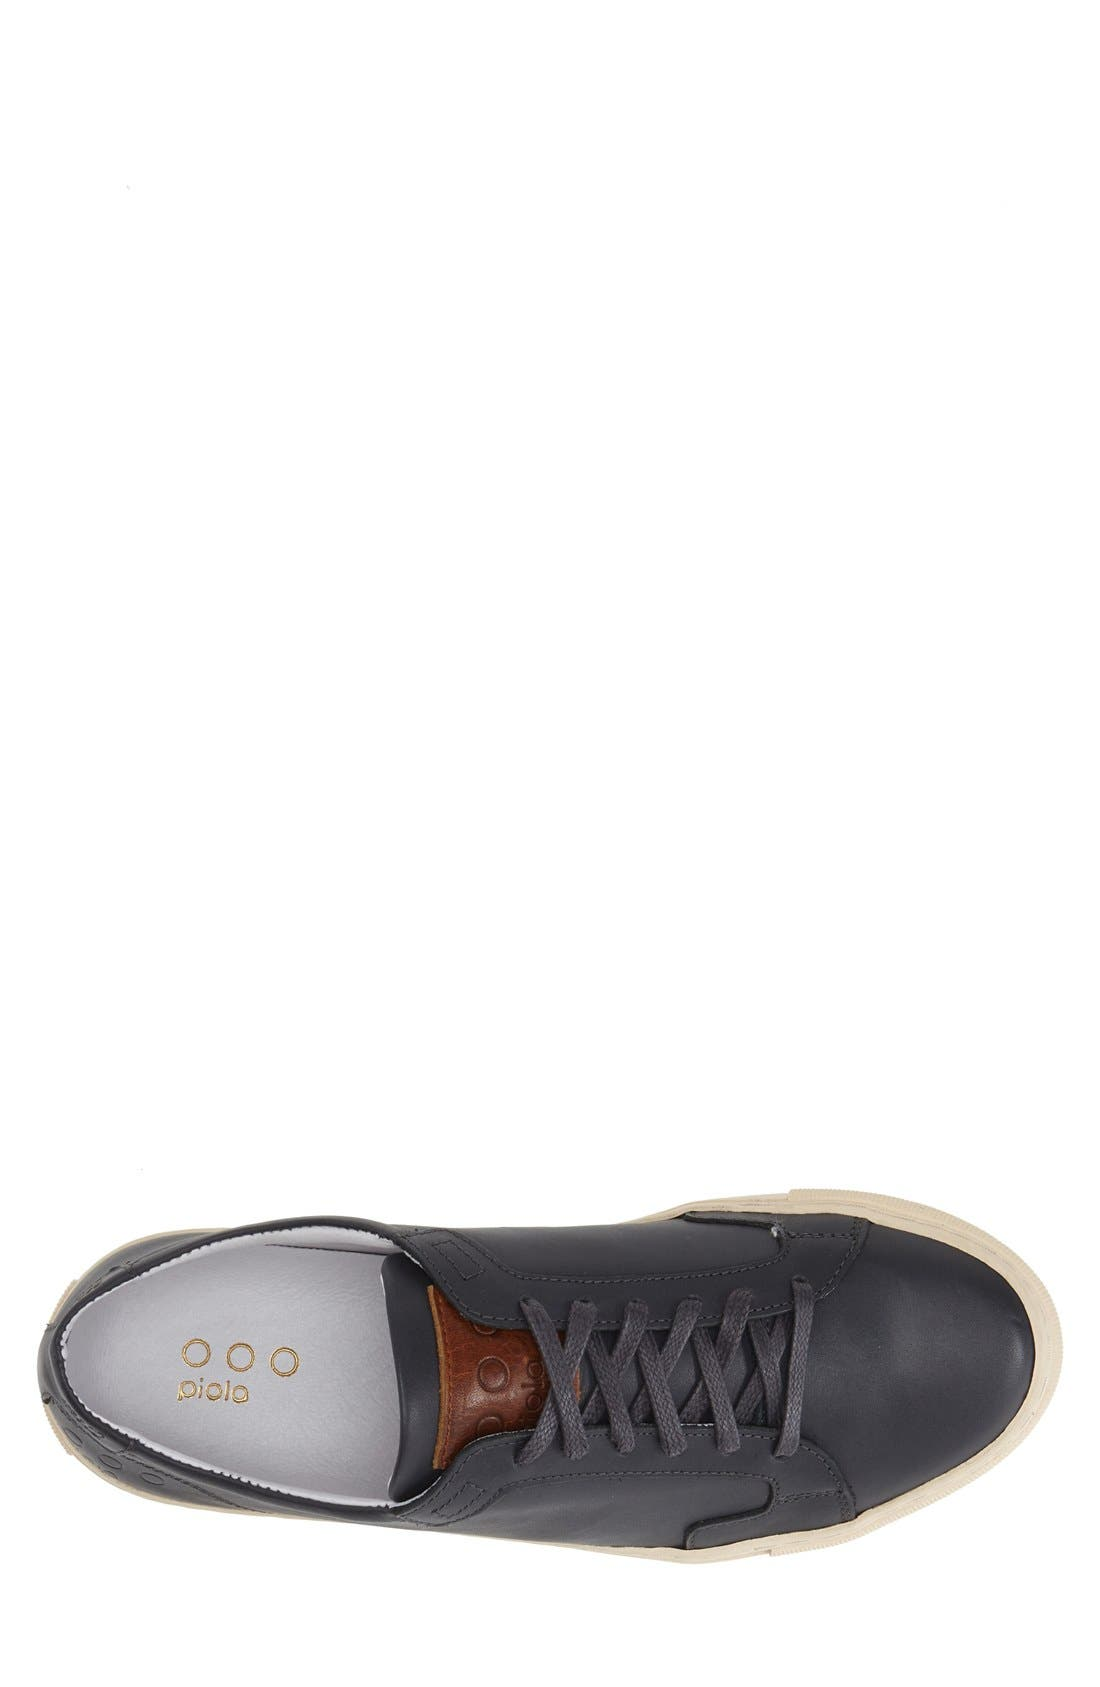 PIOLA,                             'Ica' Sneaker,                             Alternate thumbnail 2, color,                             029